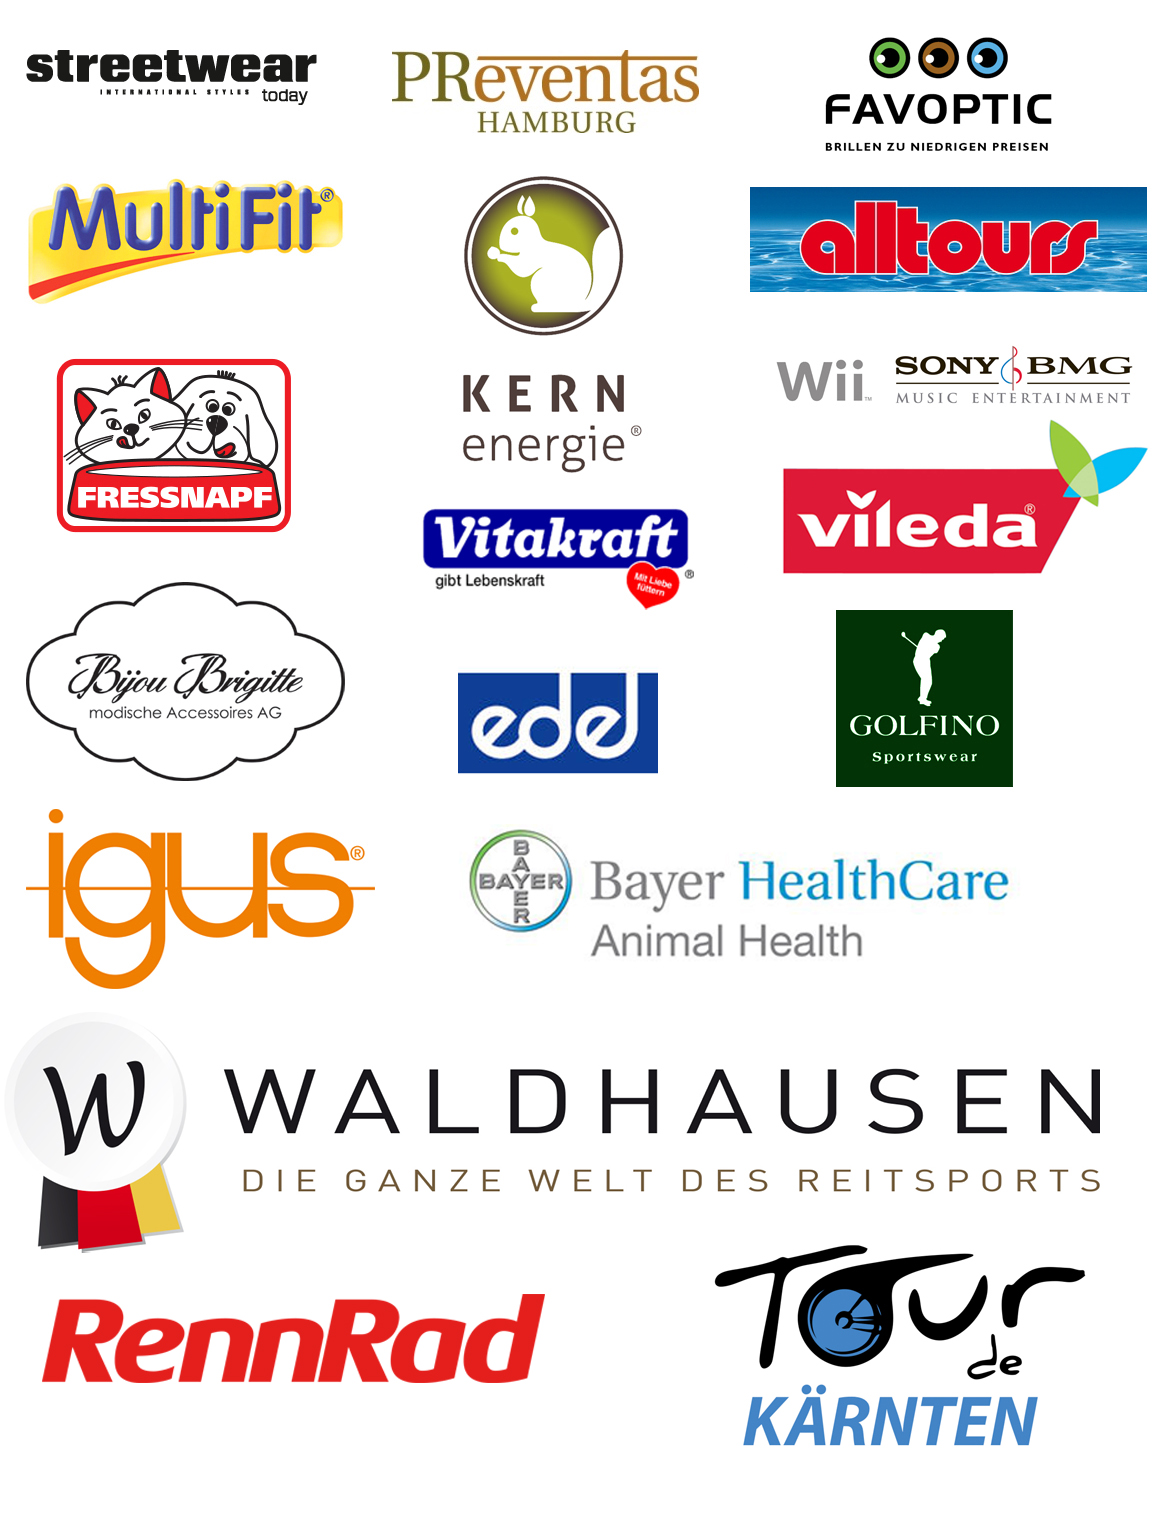 Logos_Ref.NET.jpg